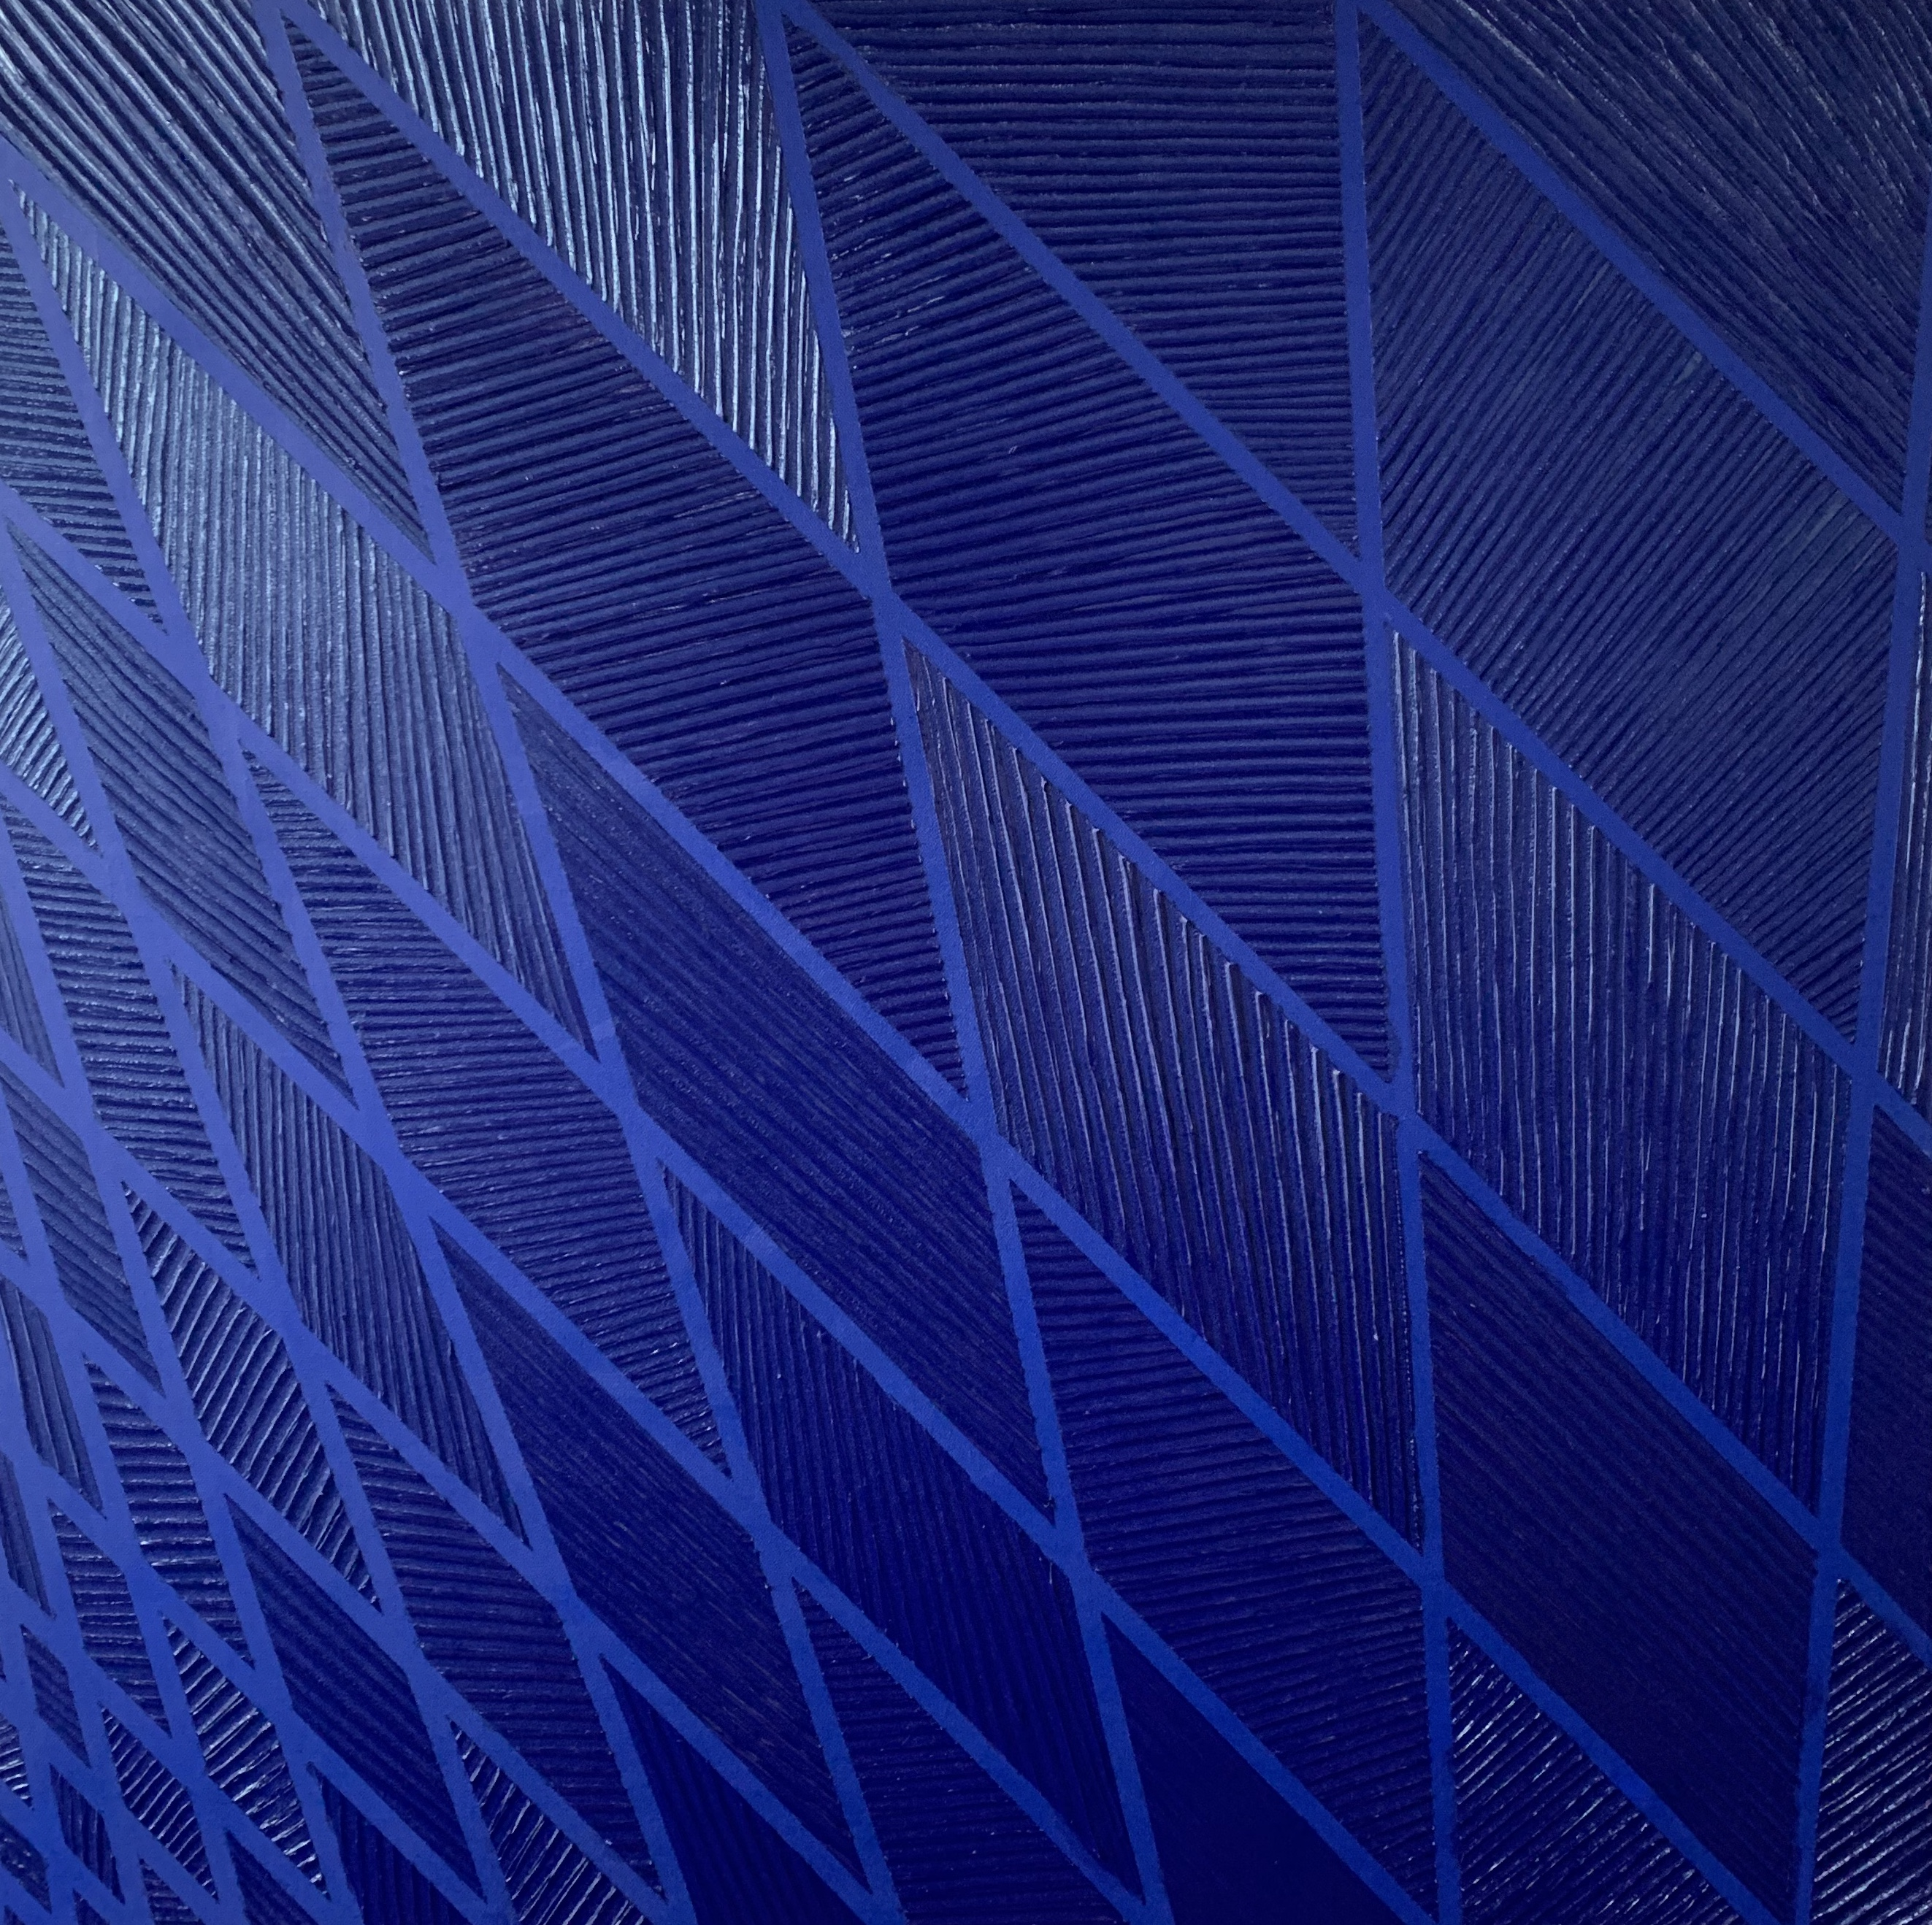 Tower - Monochrome Blue